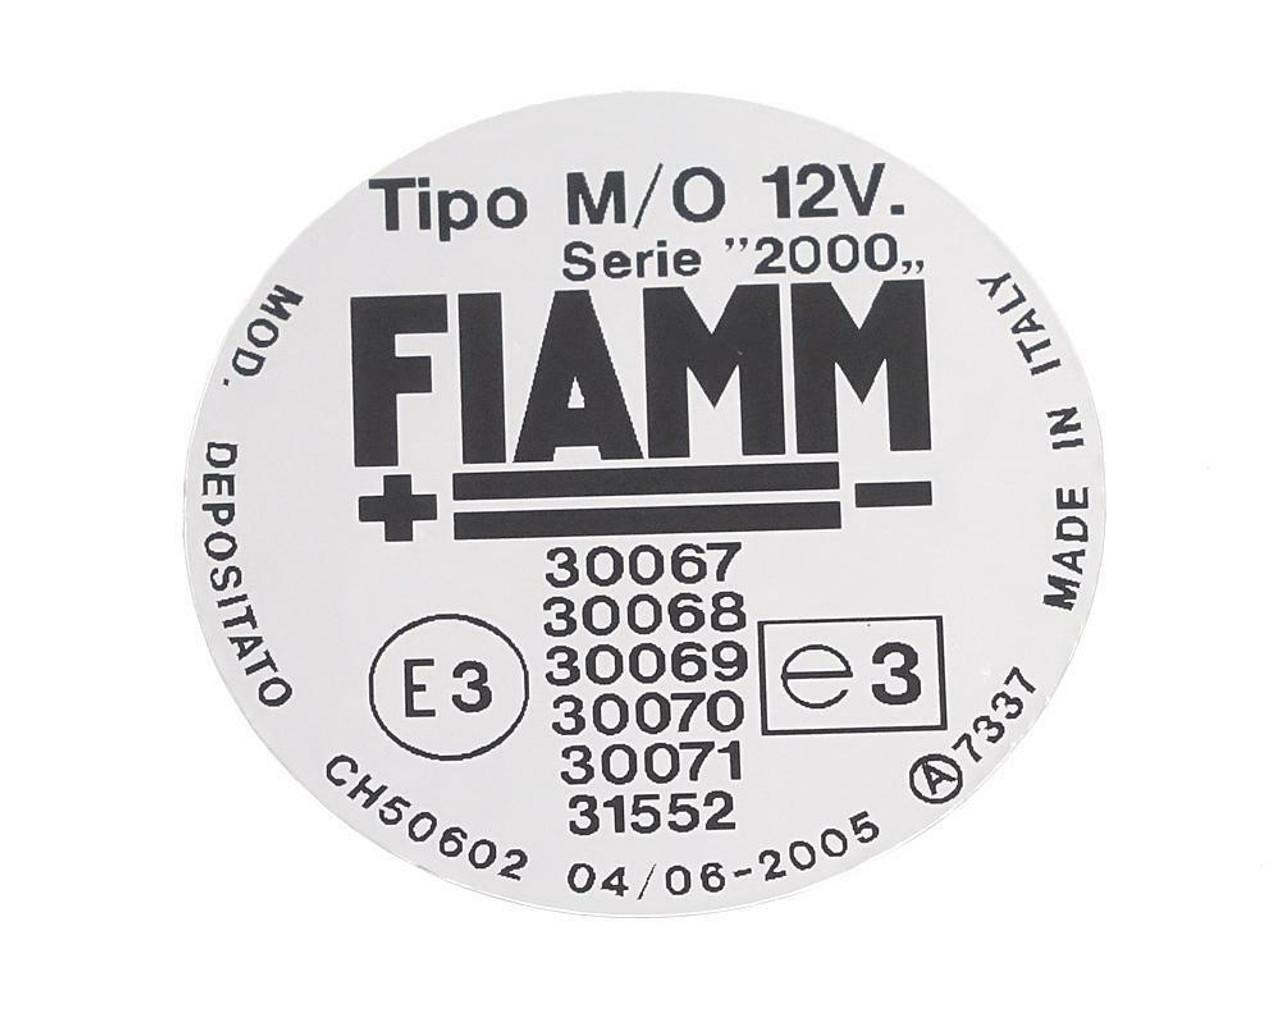 FIAMM Compressor Decal - 31552